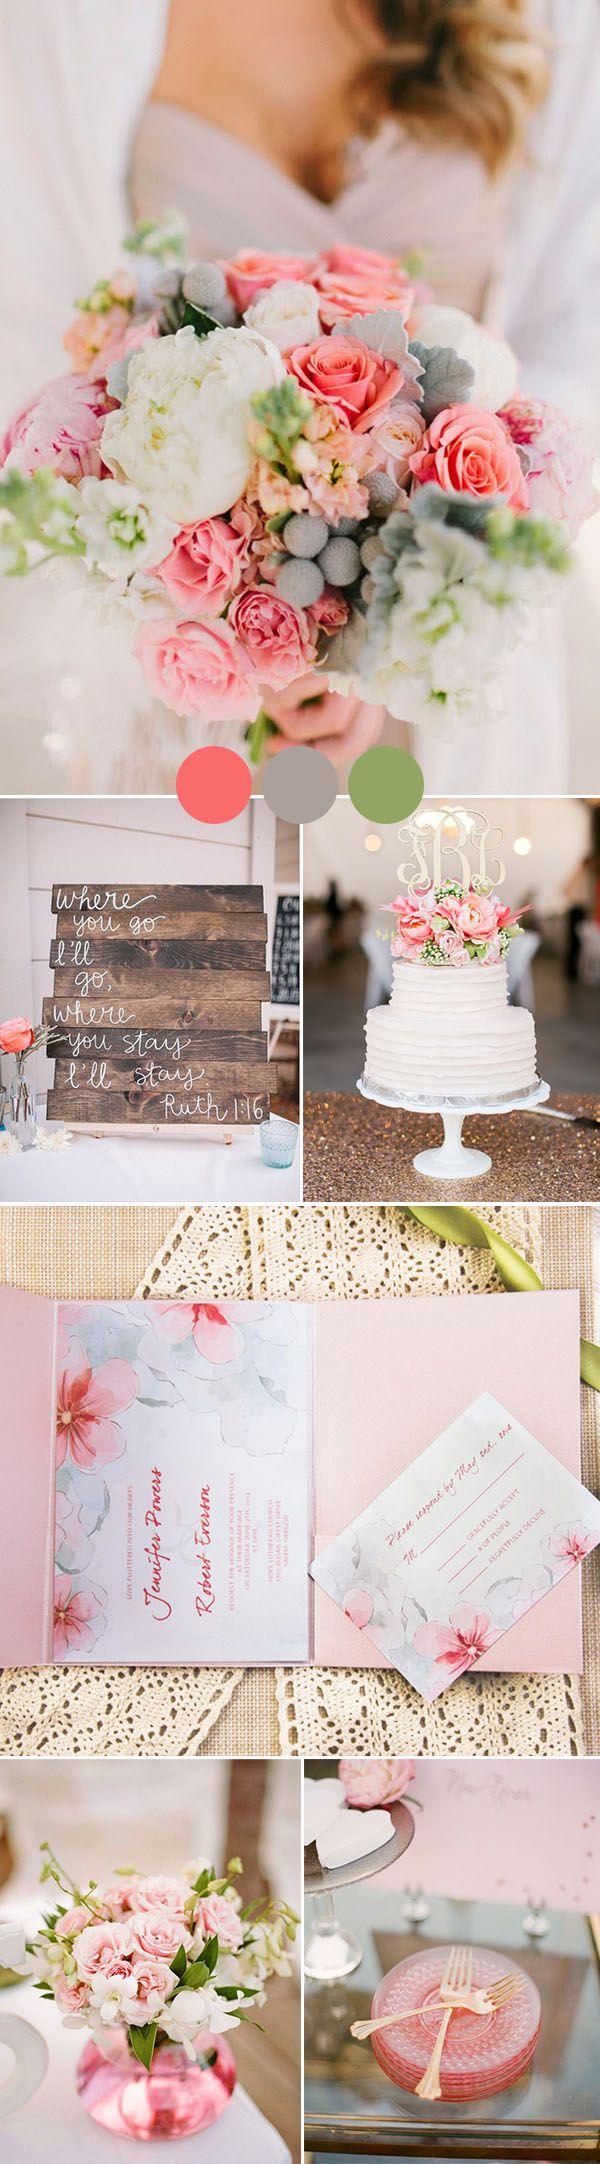 Best 25 Spring Weddings Ideas On Pinterest